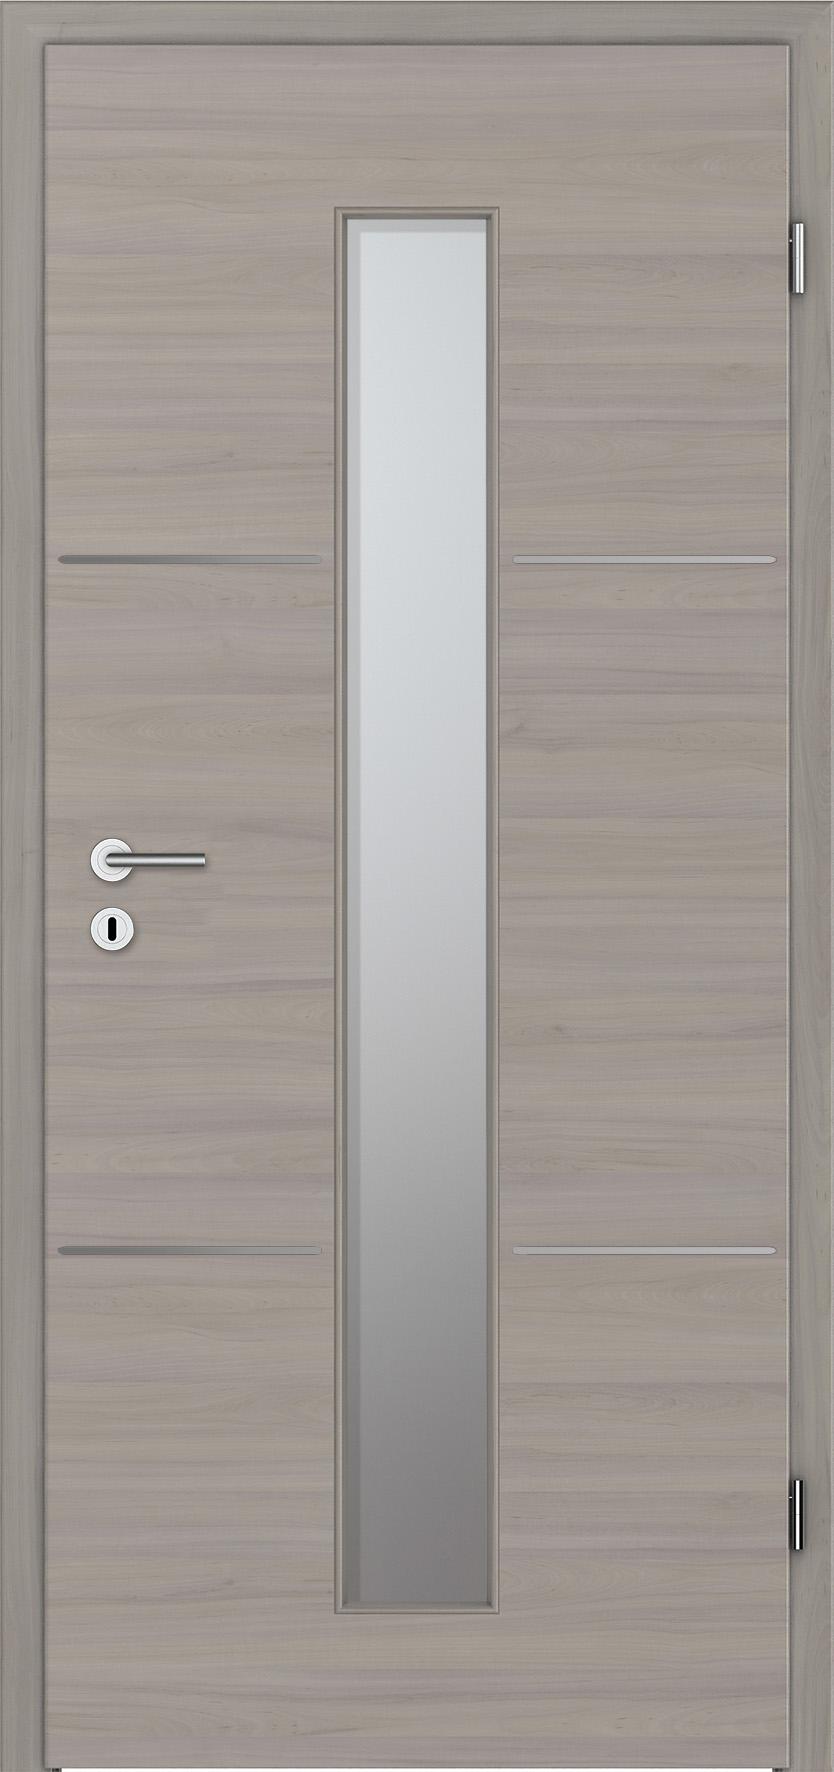 RY-531-LA2 CPL Pera Grey DQ